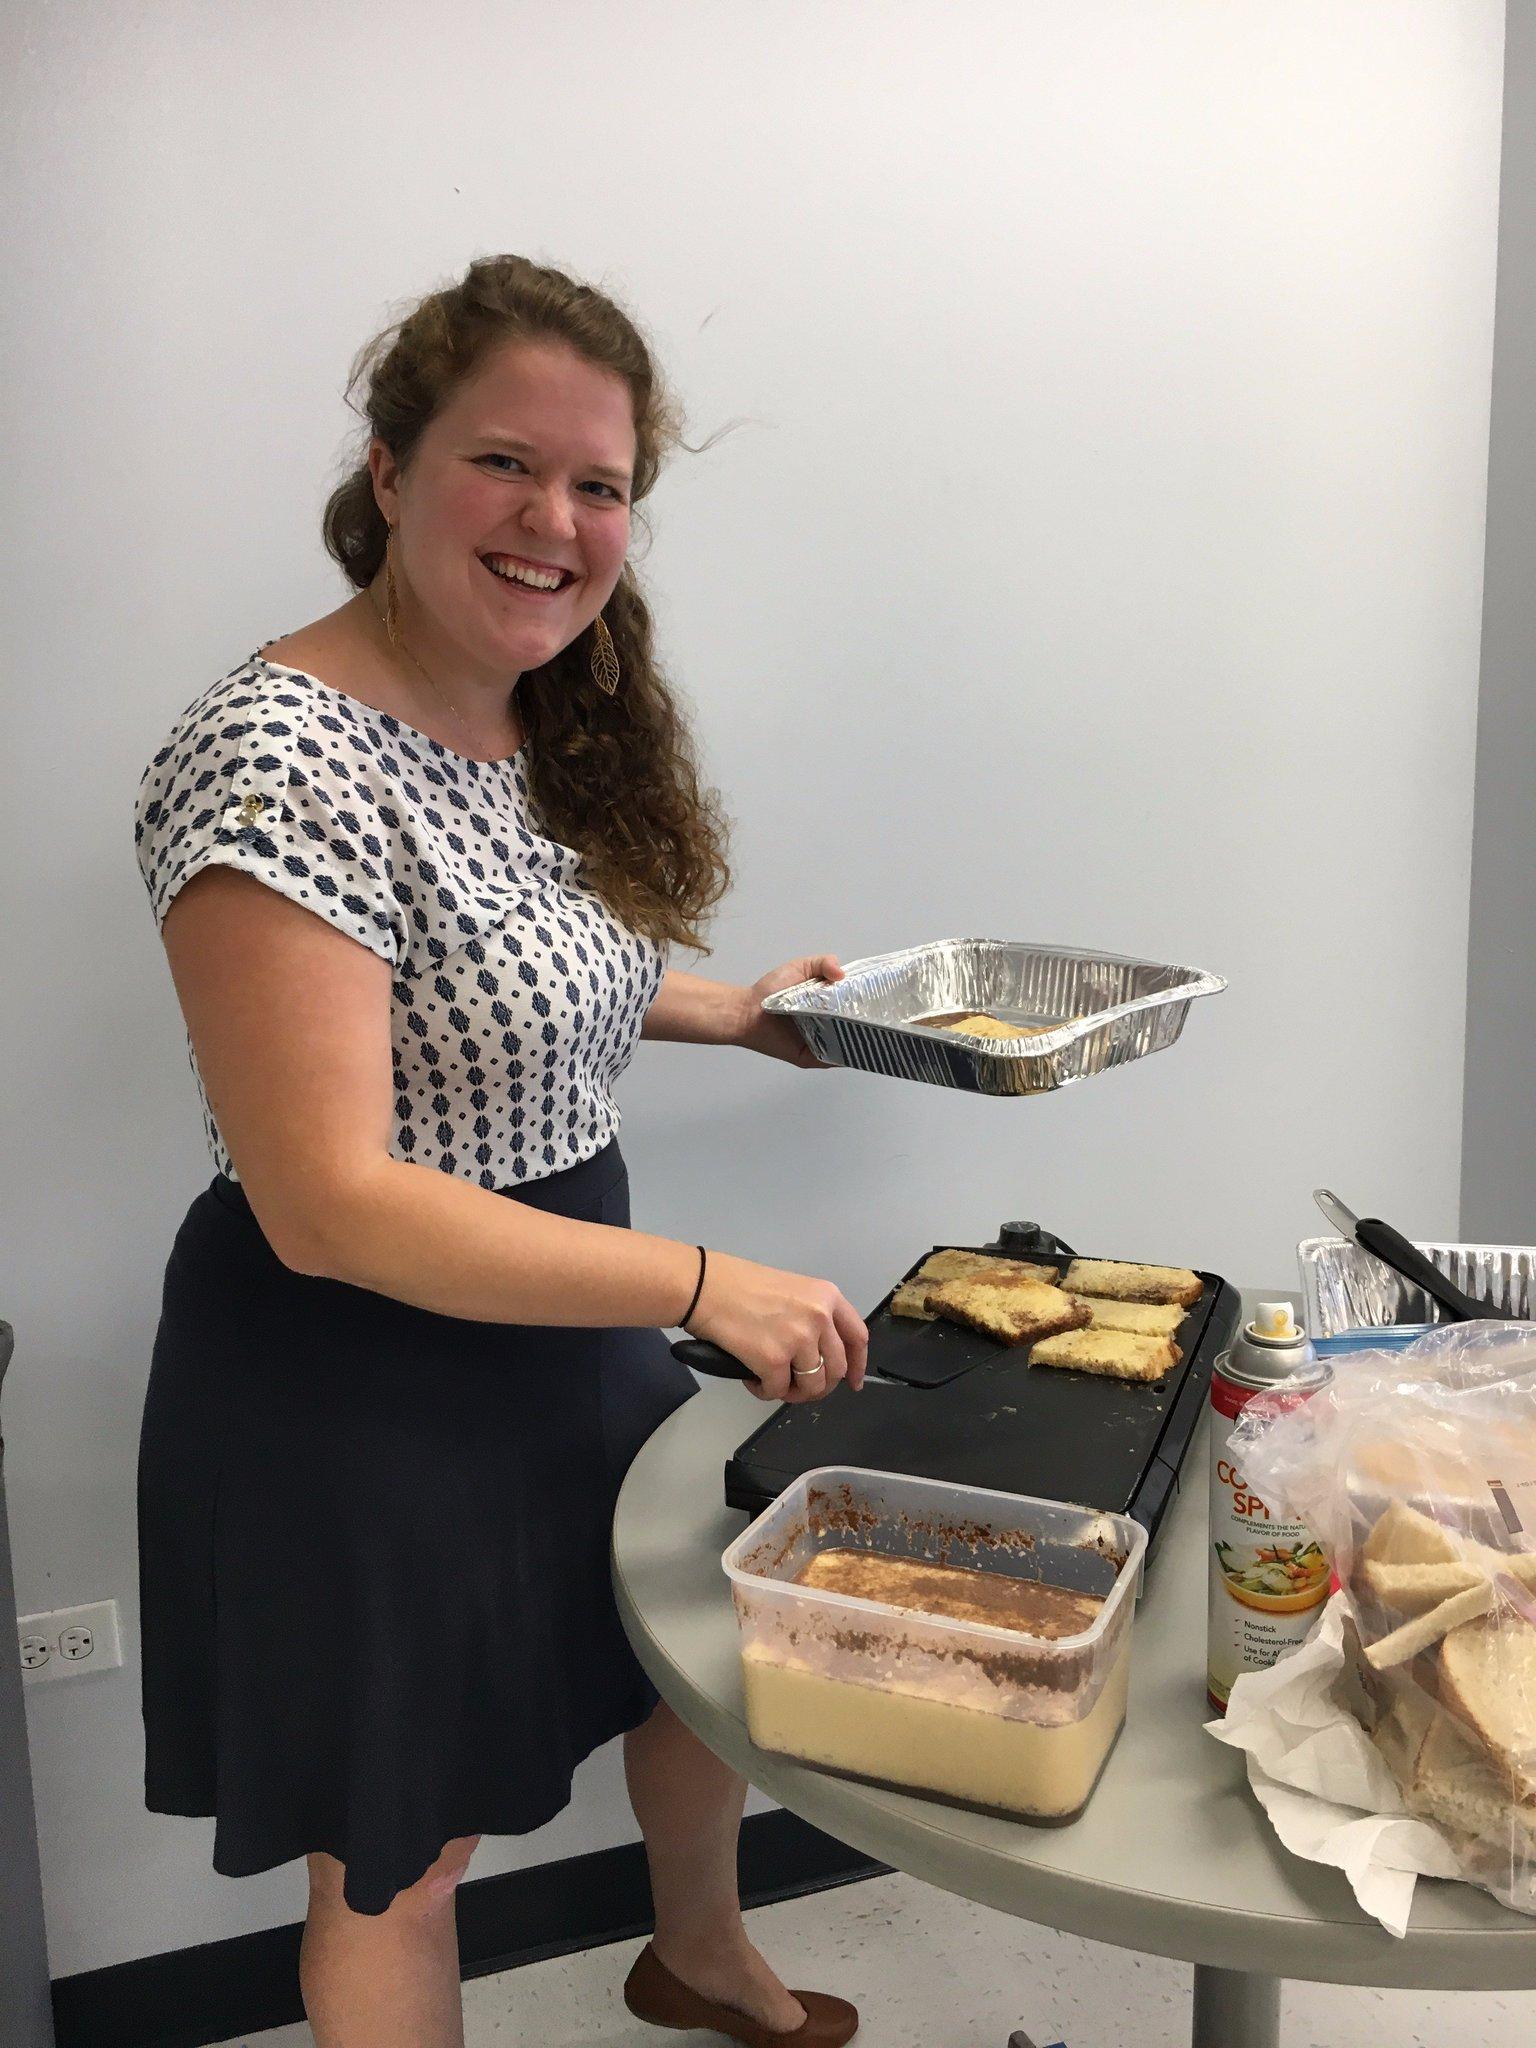 Breakfast fundraiser for @marchofdimesHI Hawaiian sweetbread french toast 🥞hot off the grill #ceridianhawaii50 https://t.co/cu7EYKu4aP